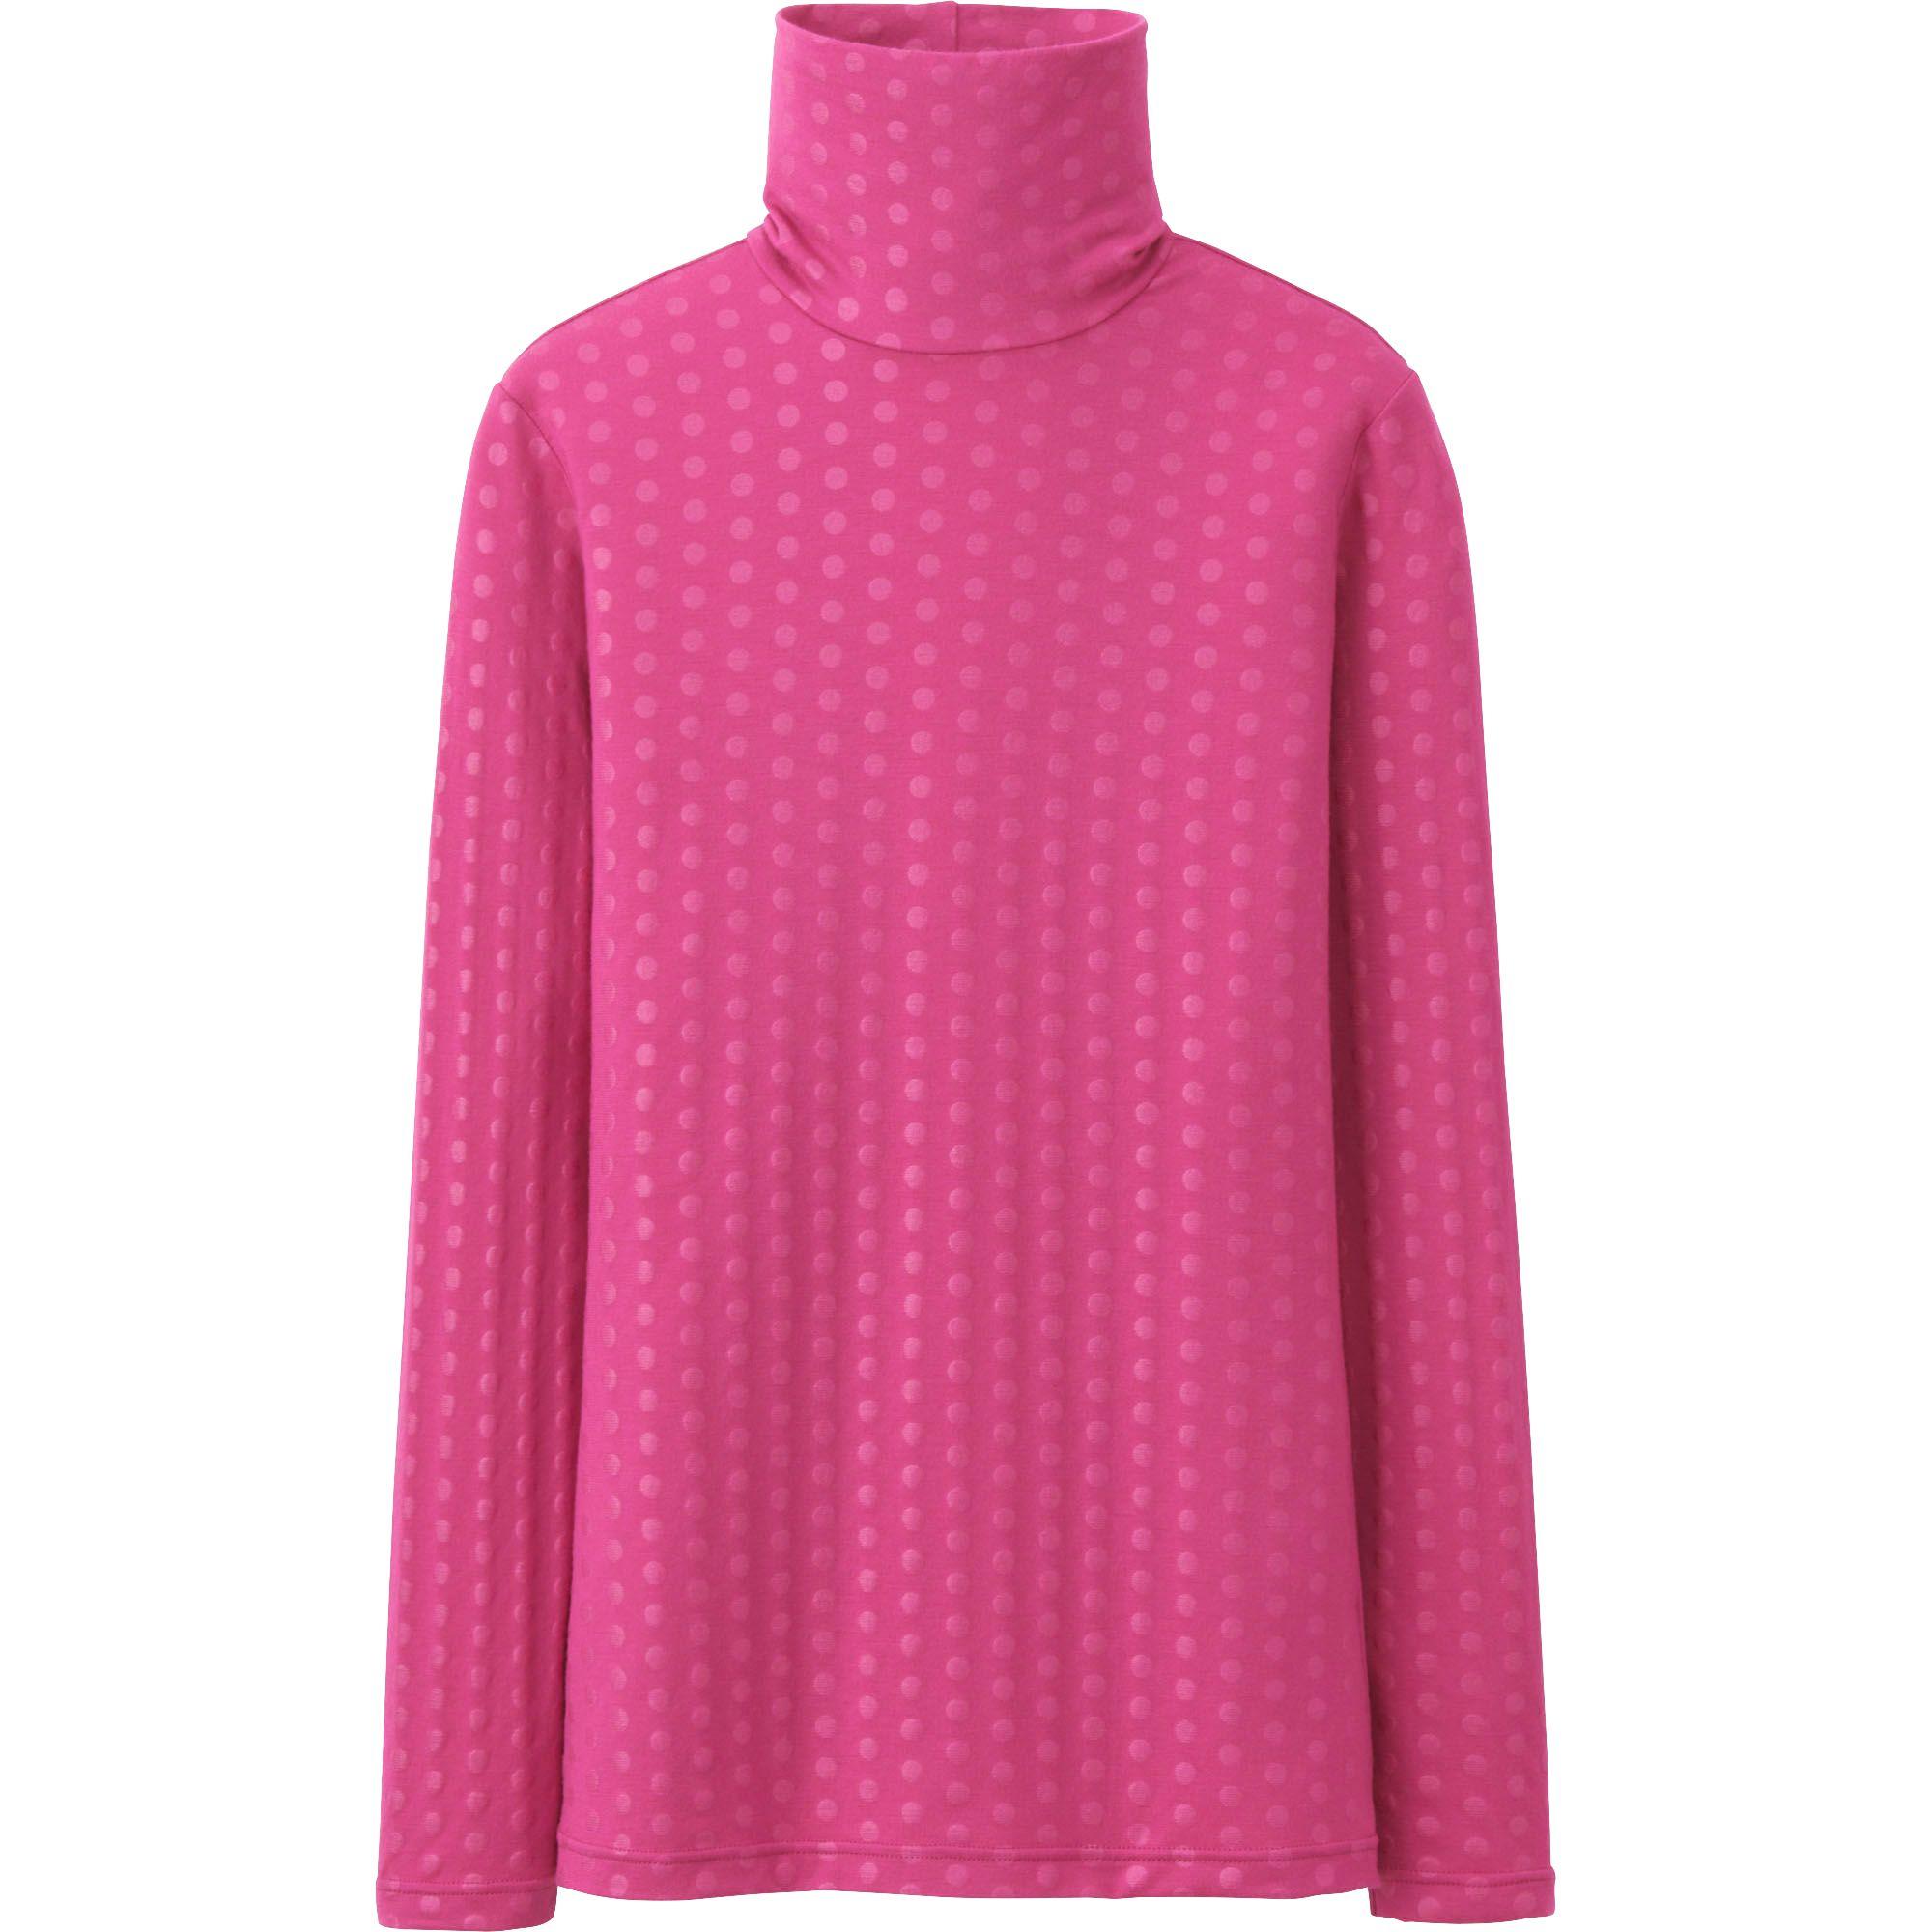 Uniqlo Pink Women Heattech Turtle Neck T Shirt Long